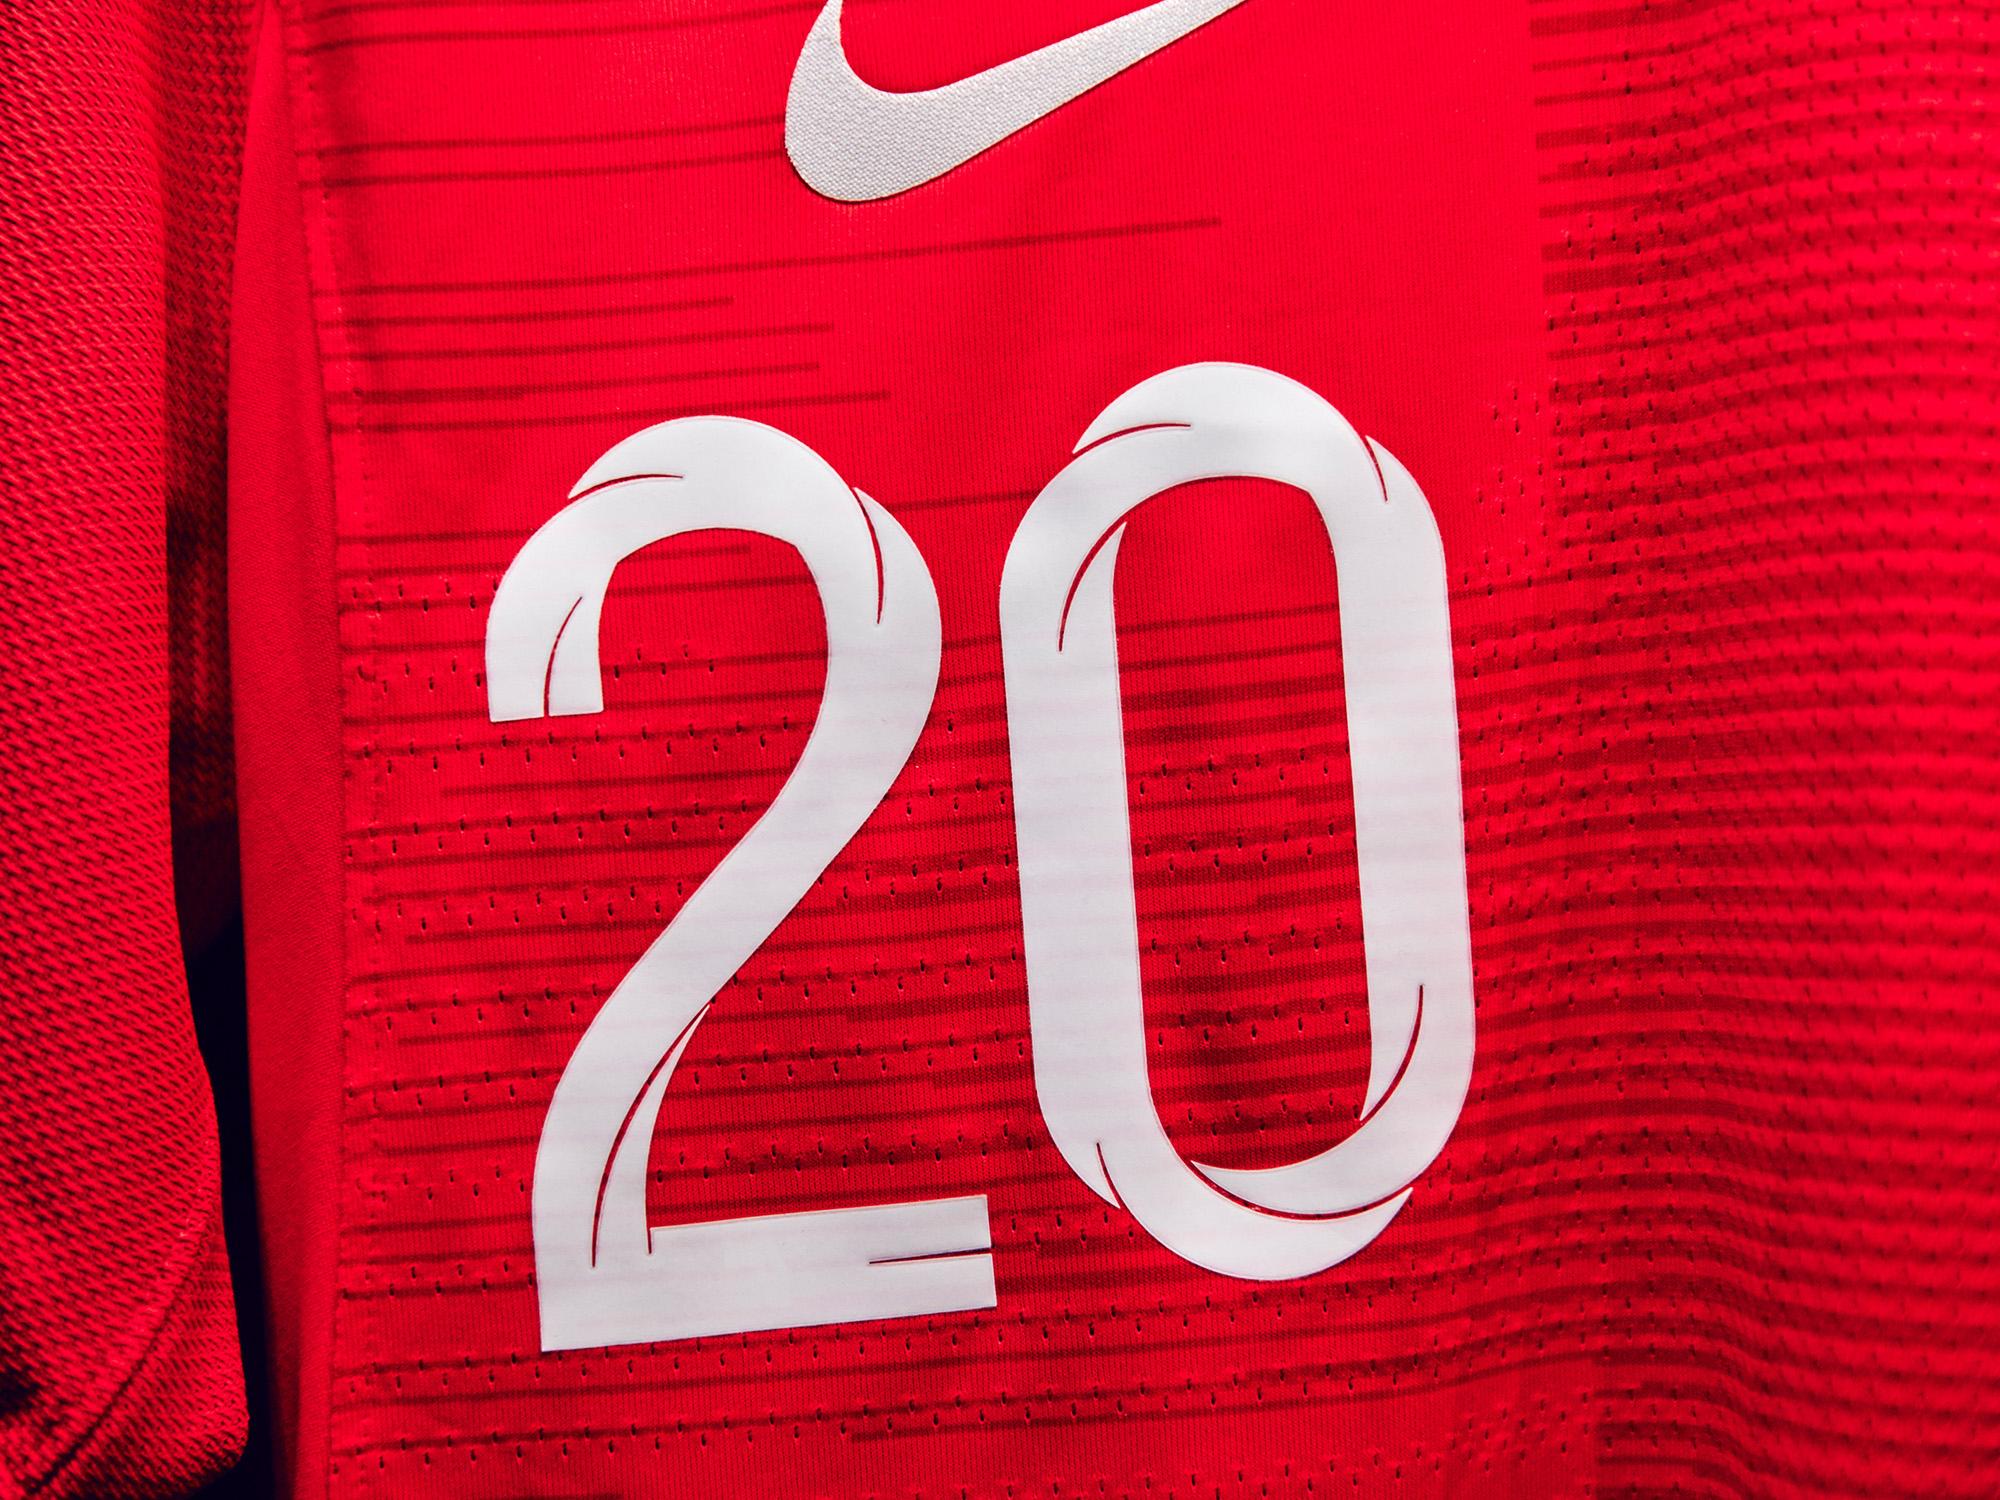 Nike-News-Football-Soccer-England-National-Team-Kit-13_77386